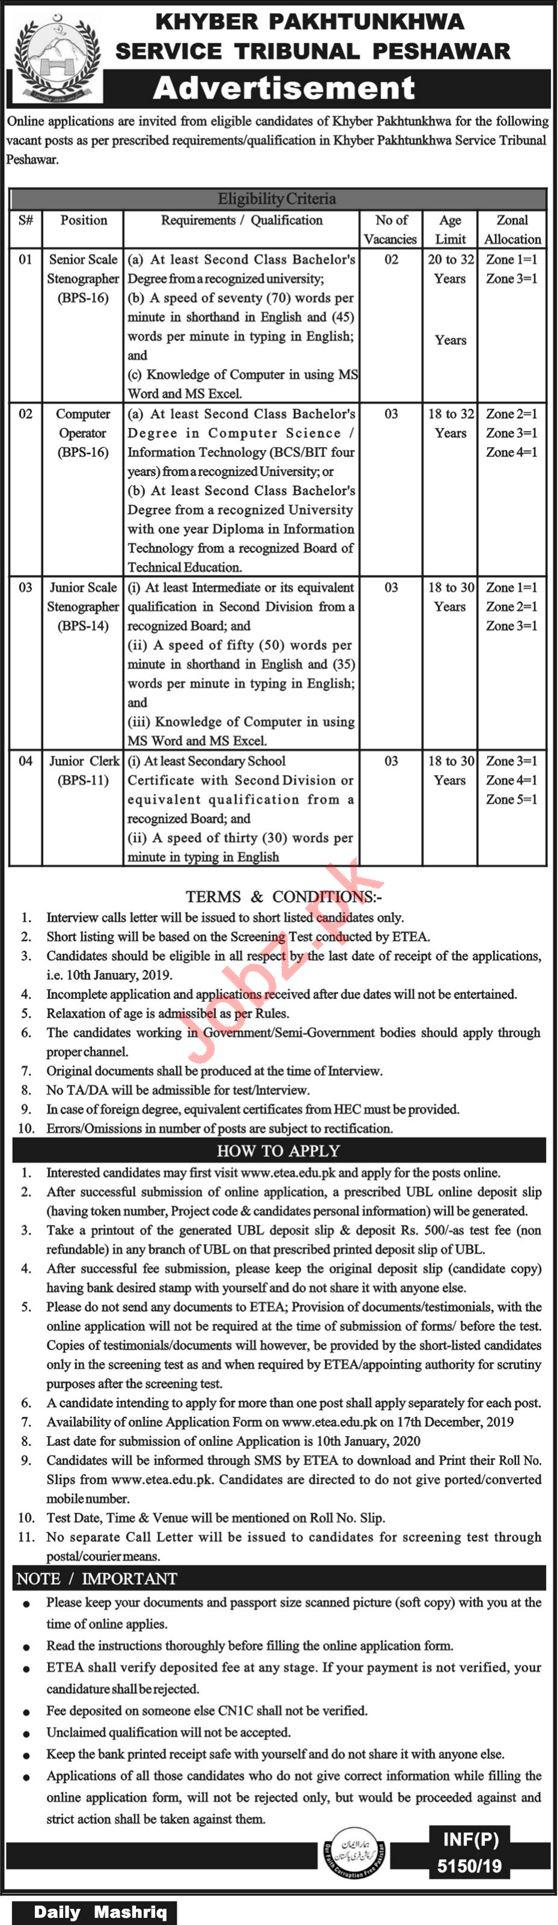 Khyber Pakhtunkhwa Service Tribunal Jobs 2020